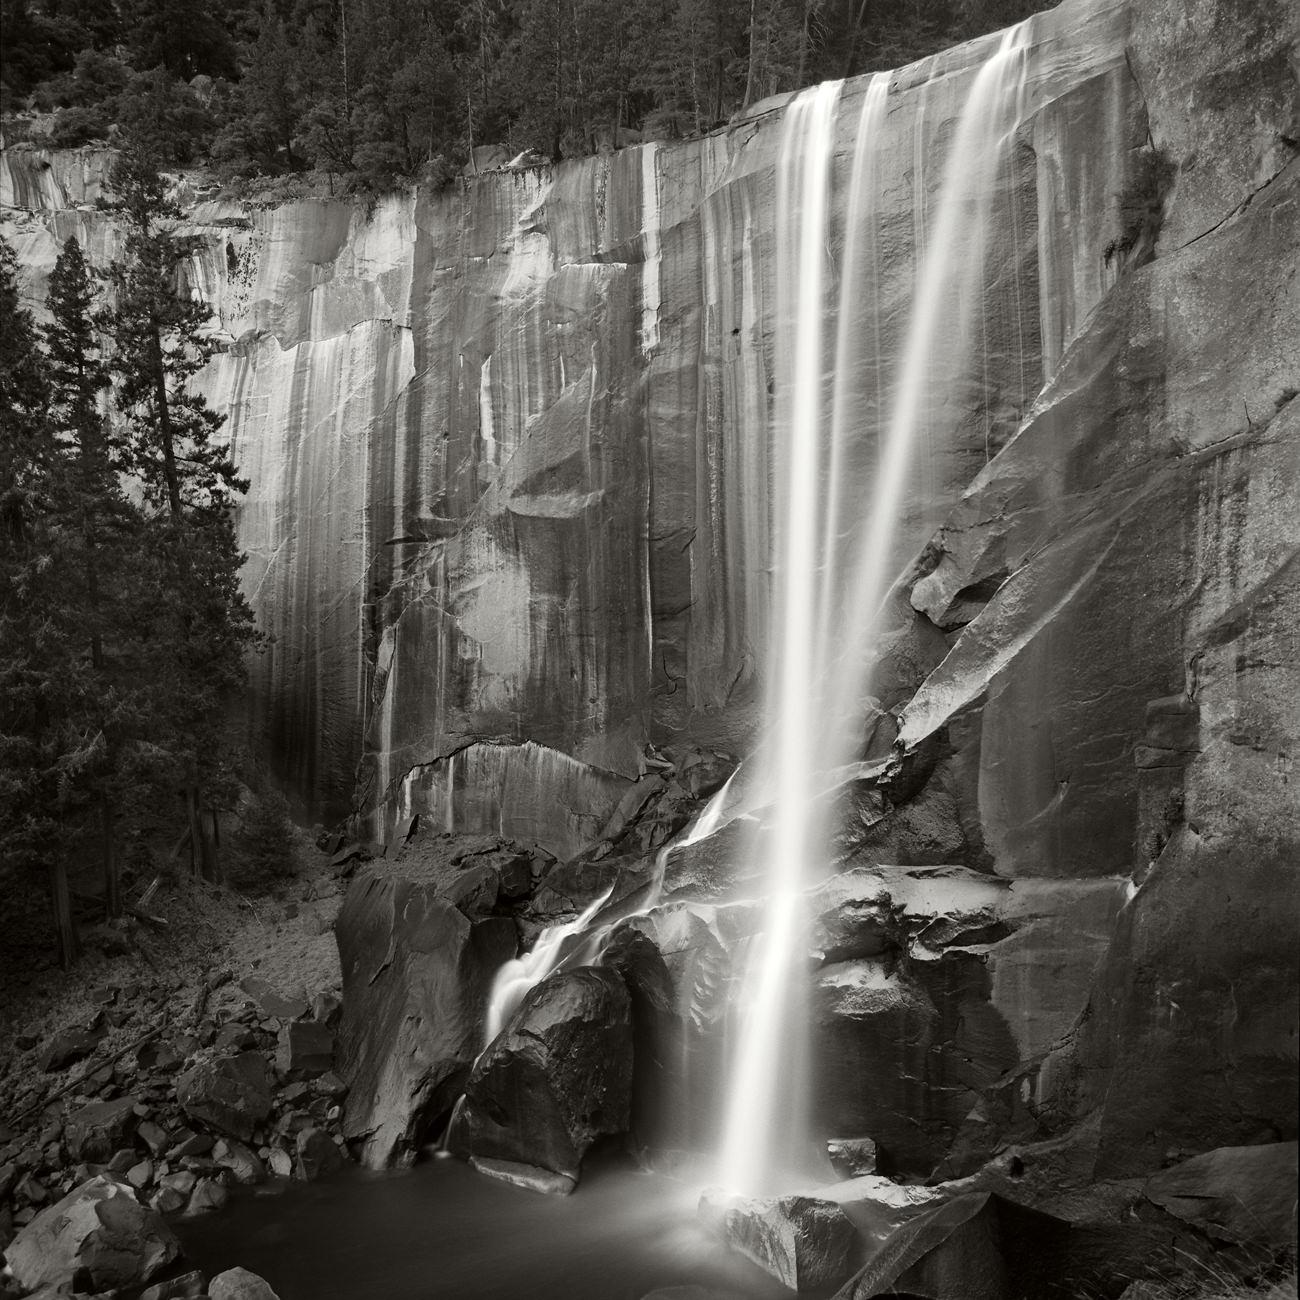 Yosemite_Vernal_1101-Lighten.jpg